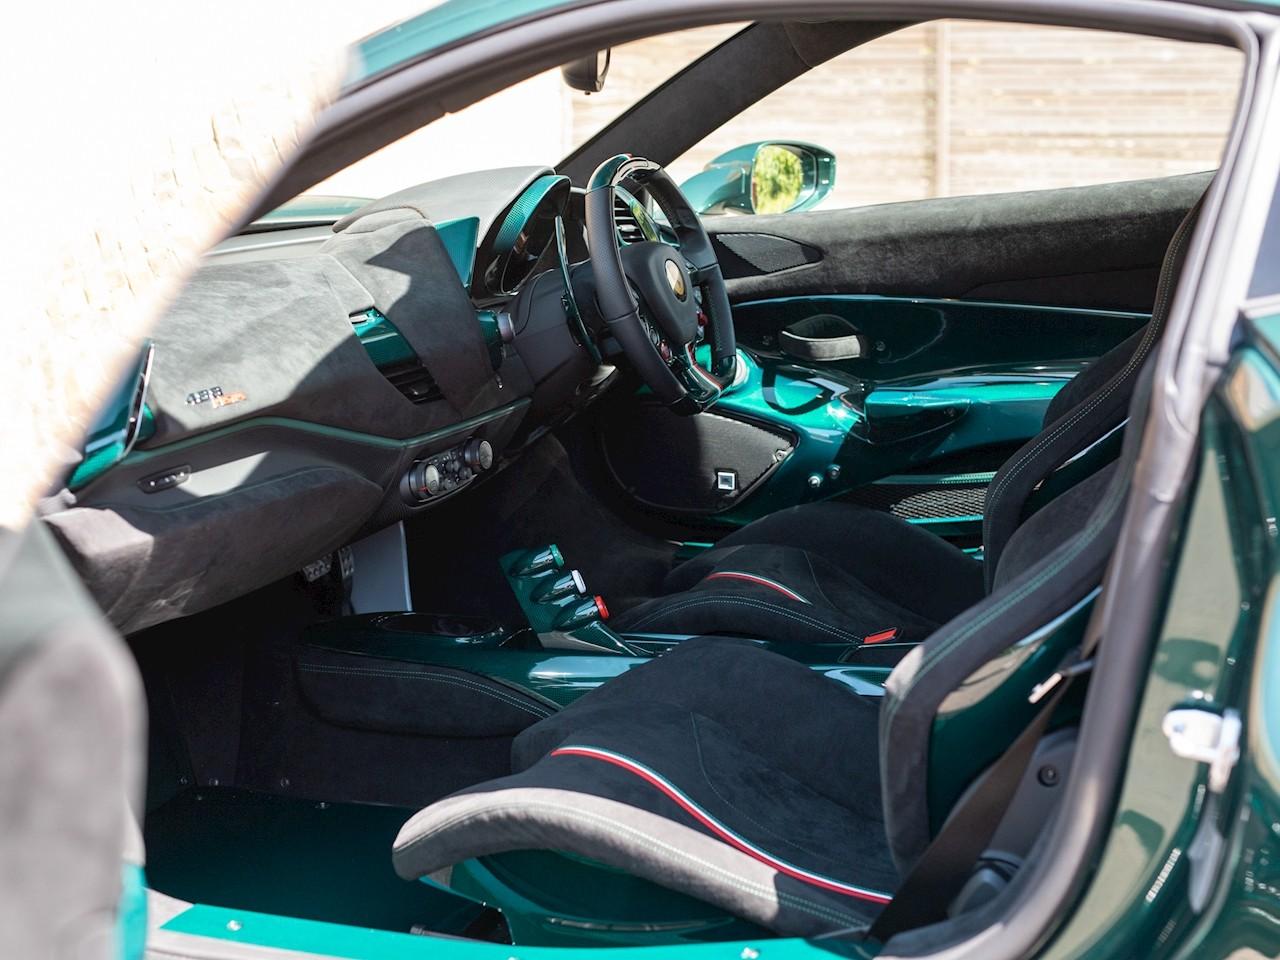 Ferrari 488 Pista in Verde Scuro - Ferrari 488 Pista in Verde Scuro